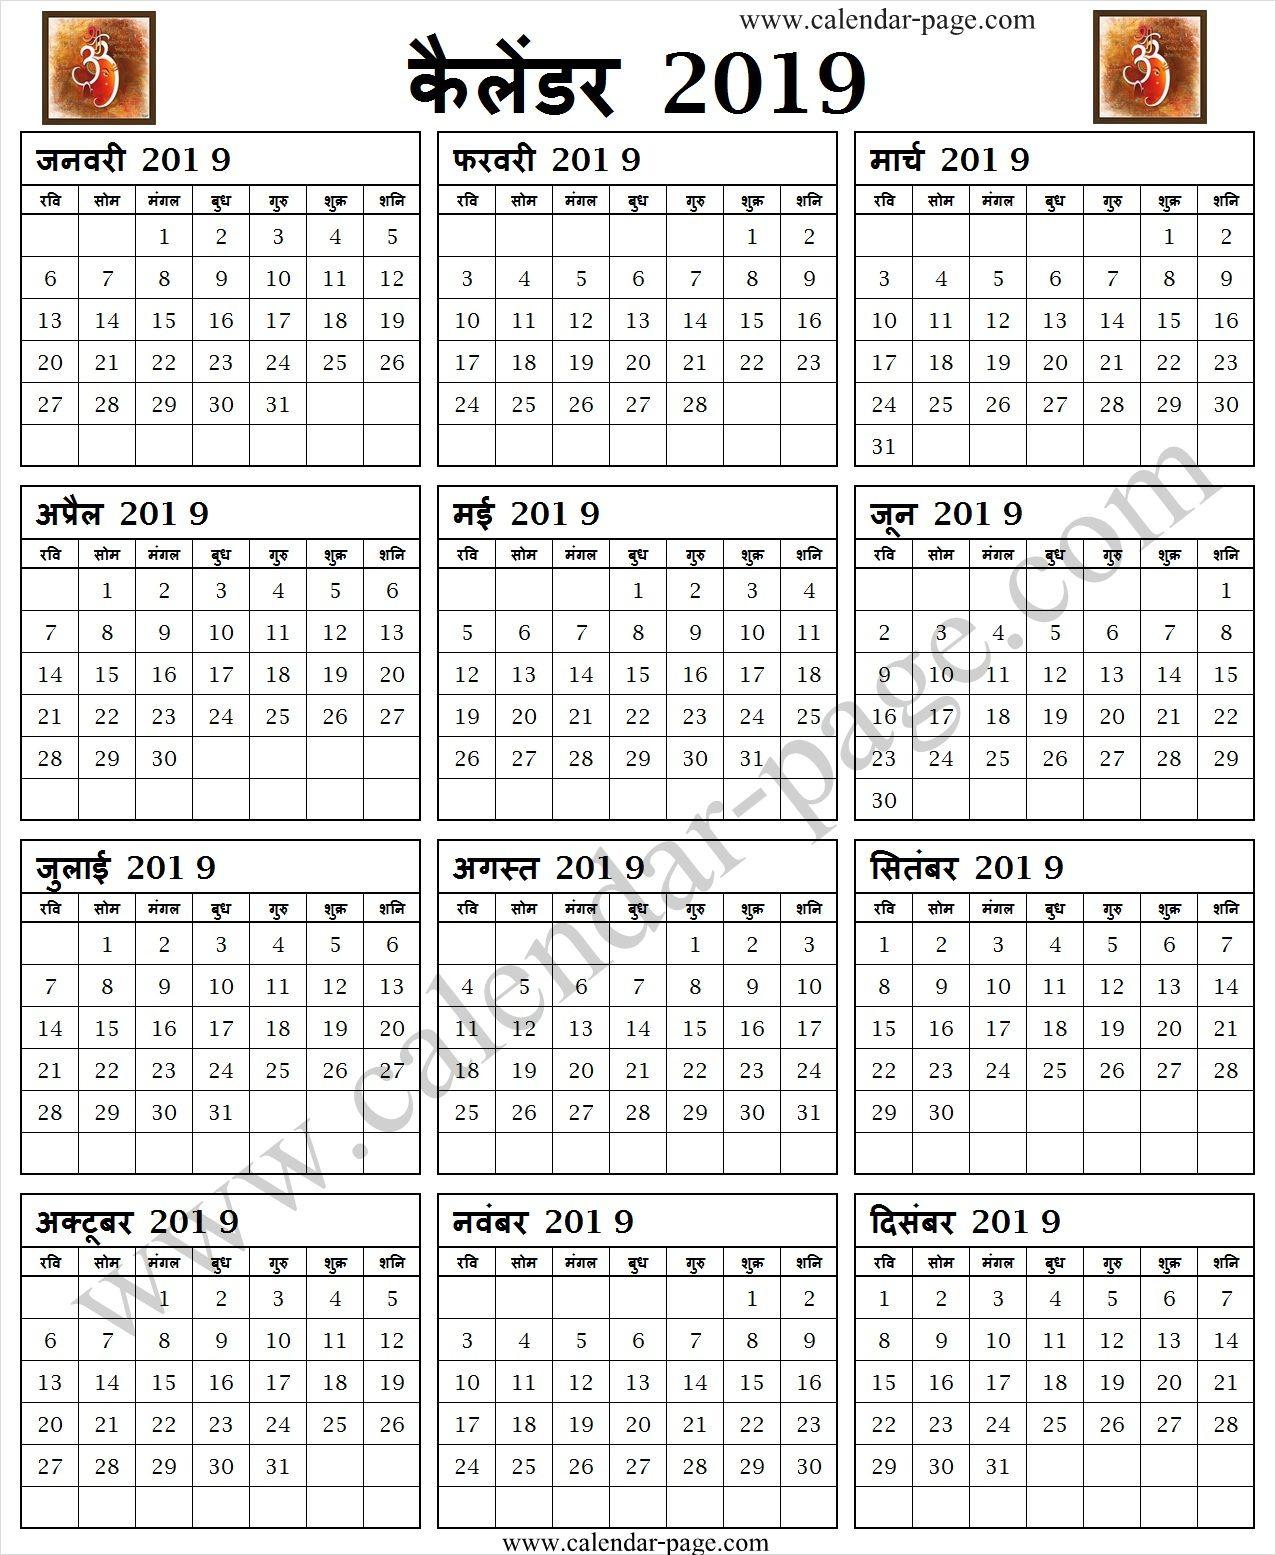 2019 Calendar Hindu 2019 Hindu Calendar In Hindi | 2019 Free Calendar To Print